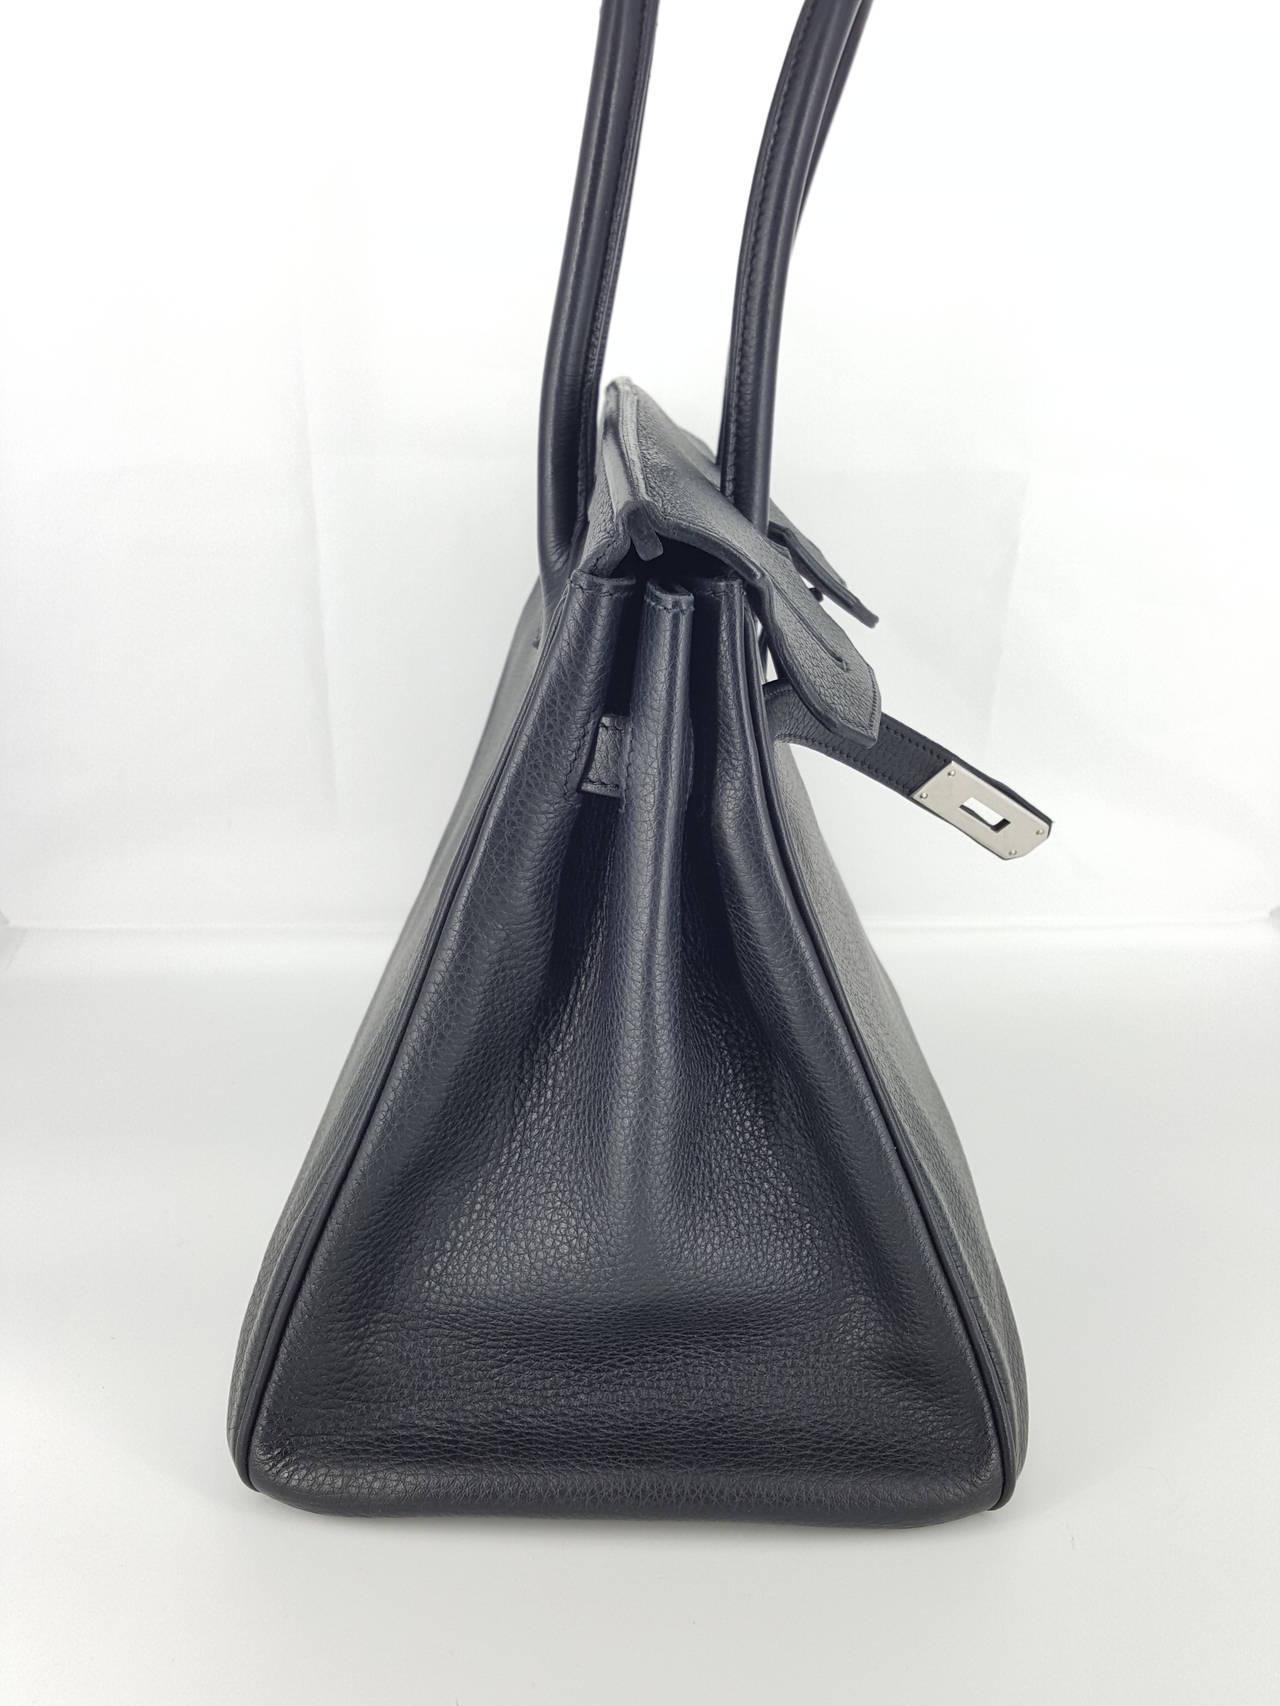 HERMES Birkin 35 CM In Black Clemence Leather With Palladium Hardware. 3